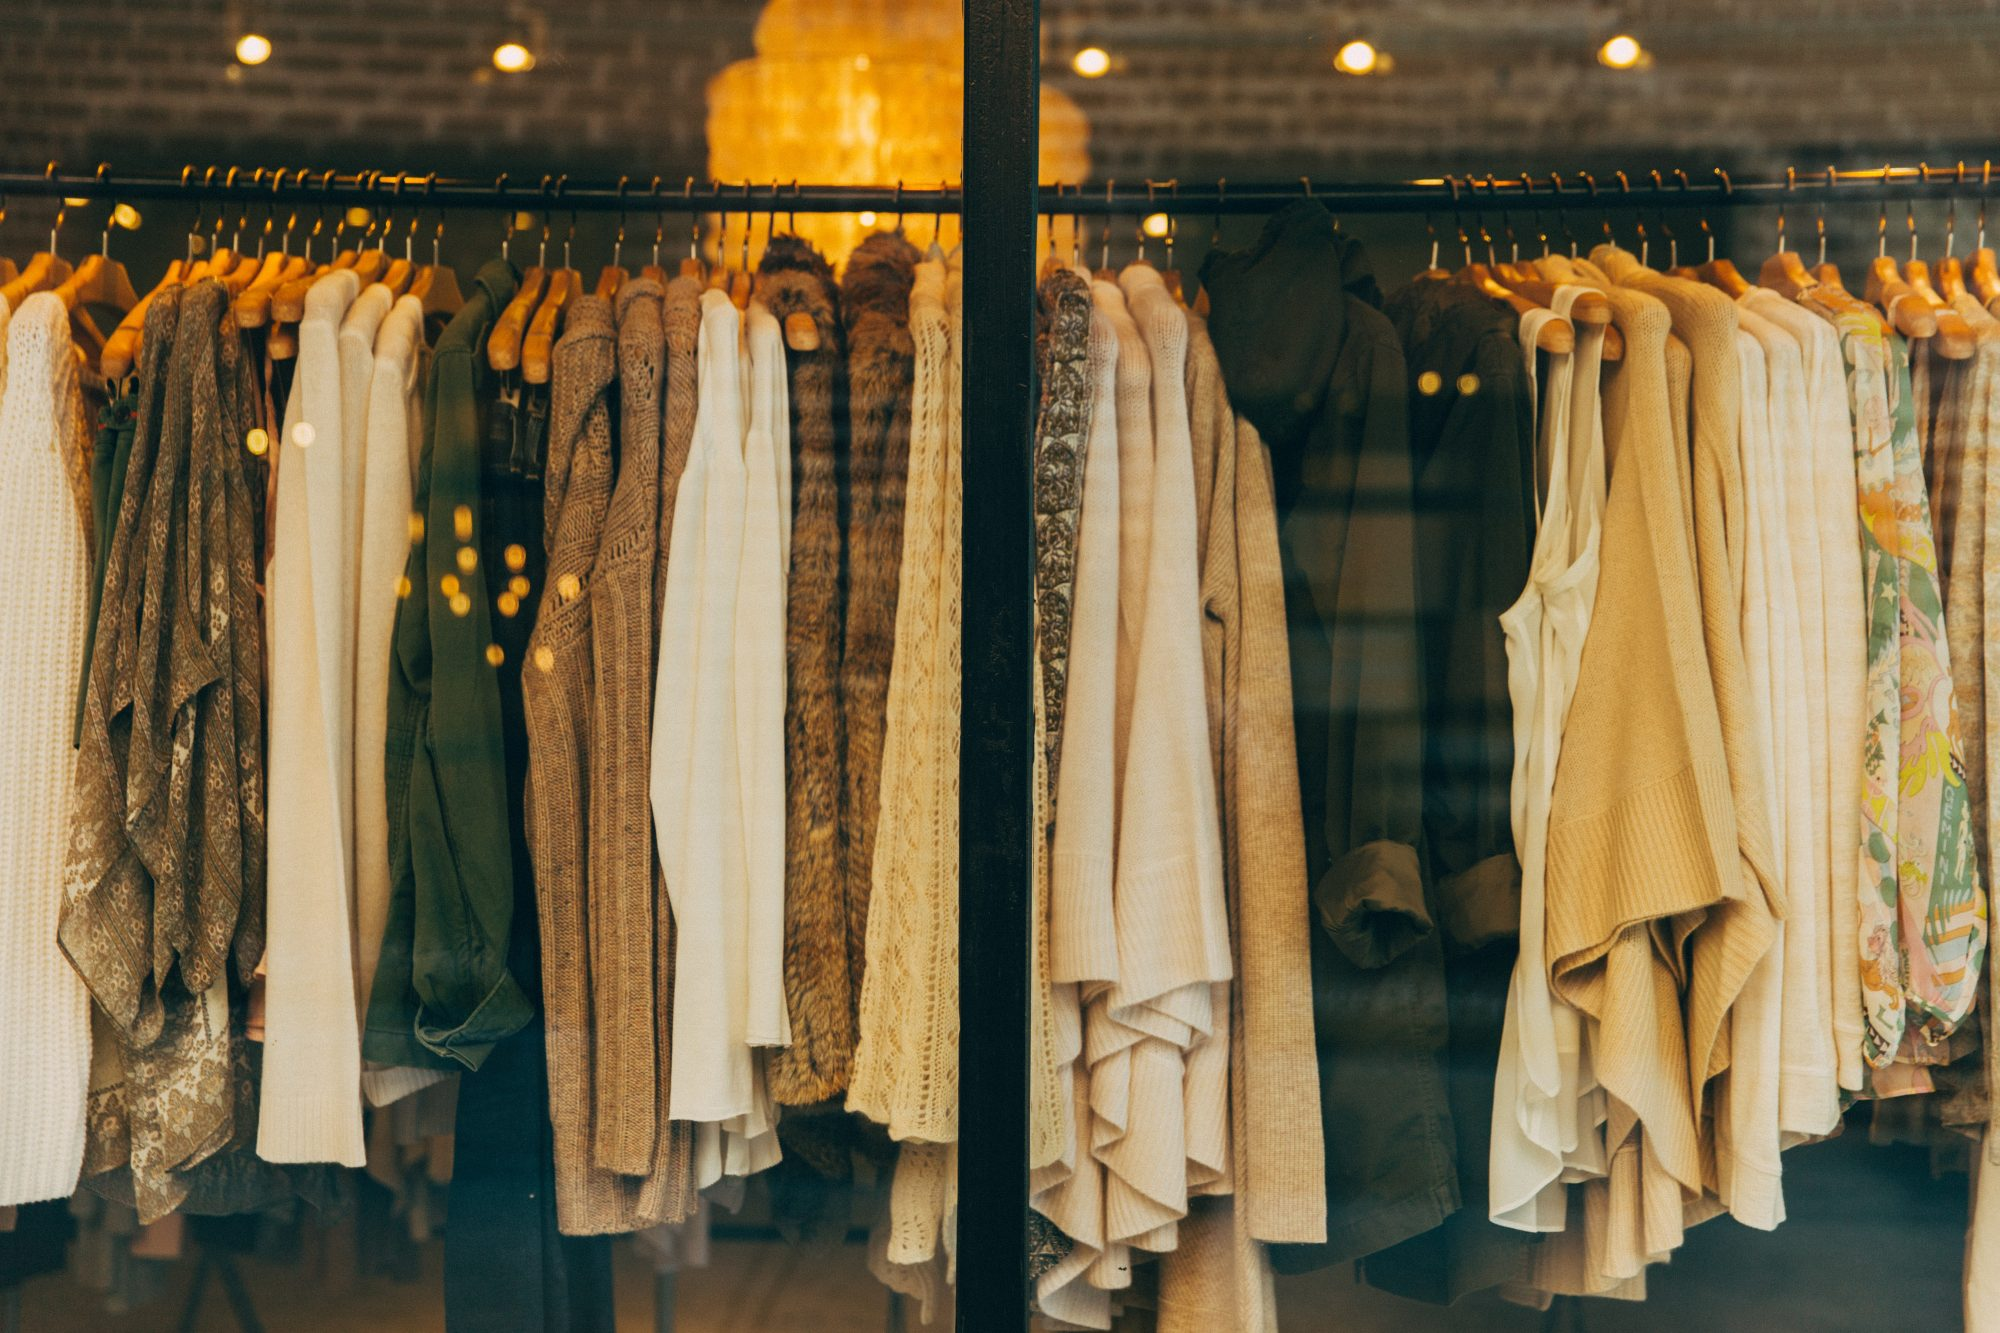 plus-size fashion eco-friendly clothing shopping